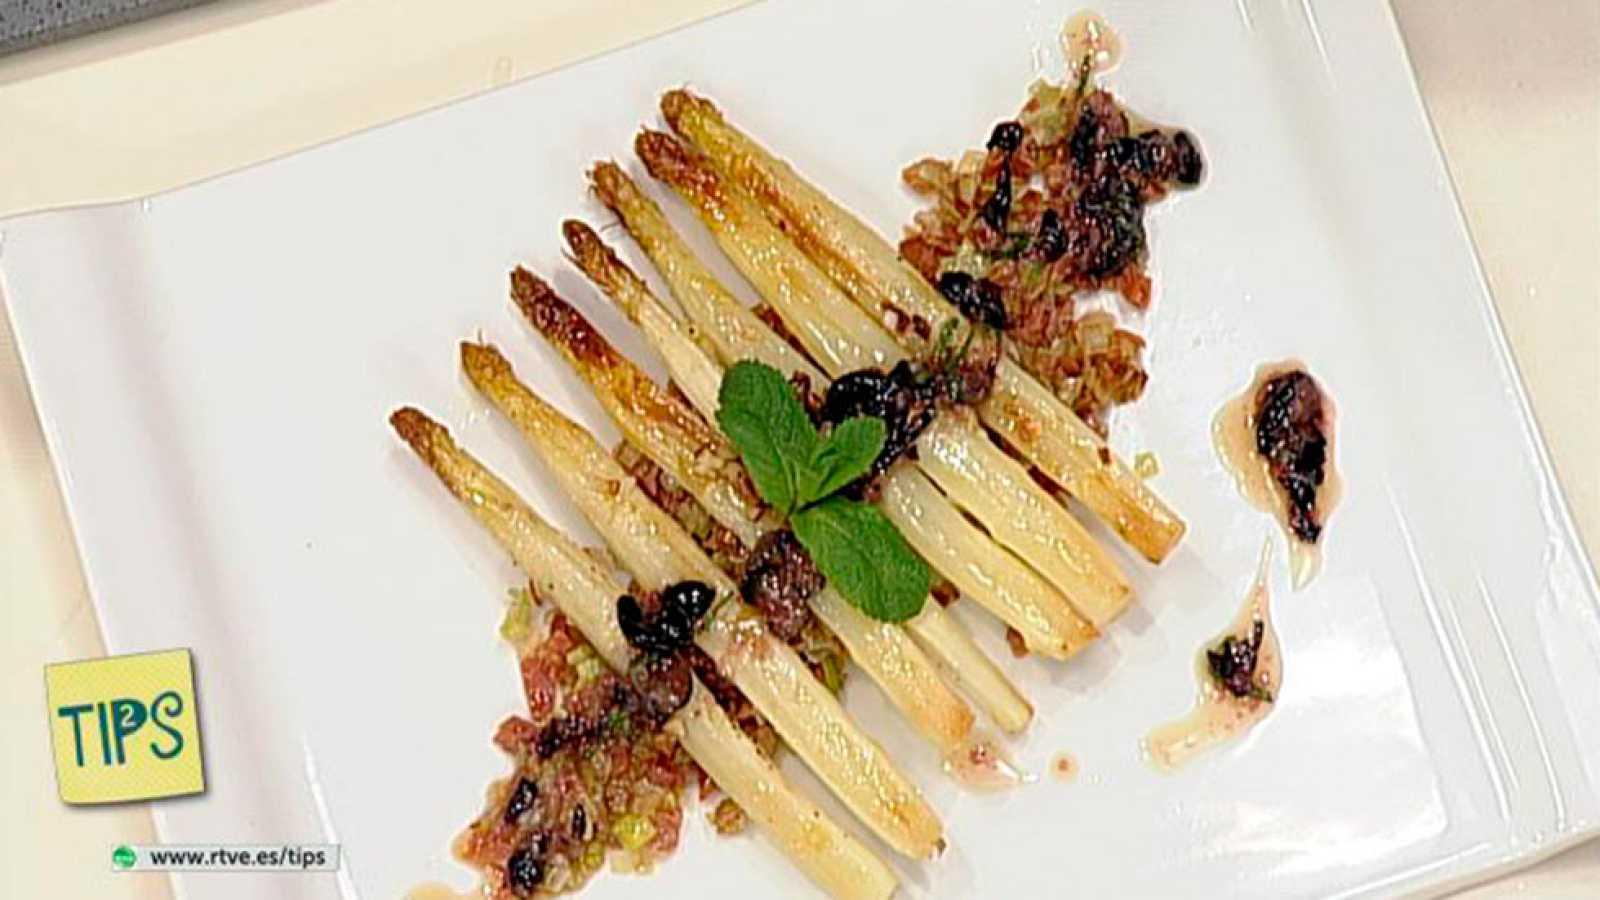 TIPS - Cocina - Espárragos asados con salsa fría de arándanos y menta